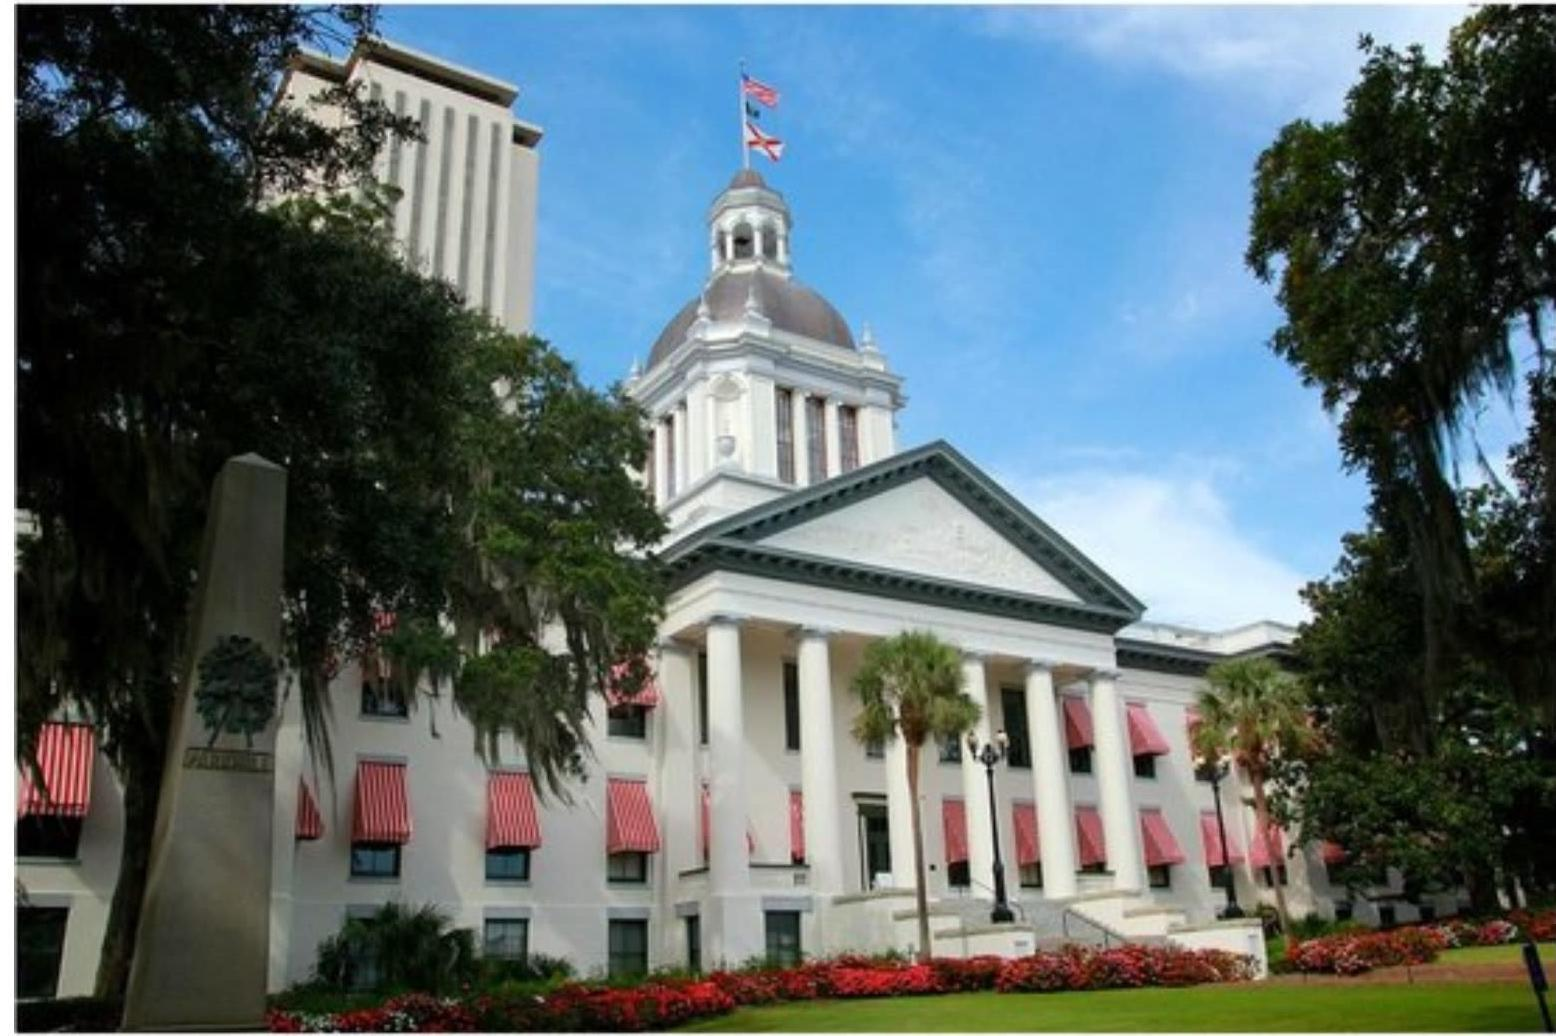 Florida Capitol Buildings, Tallahassee